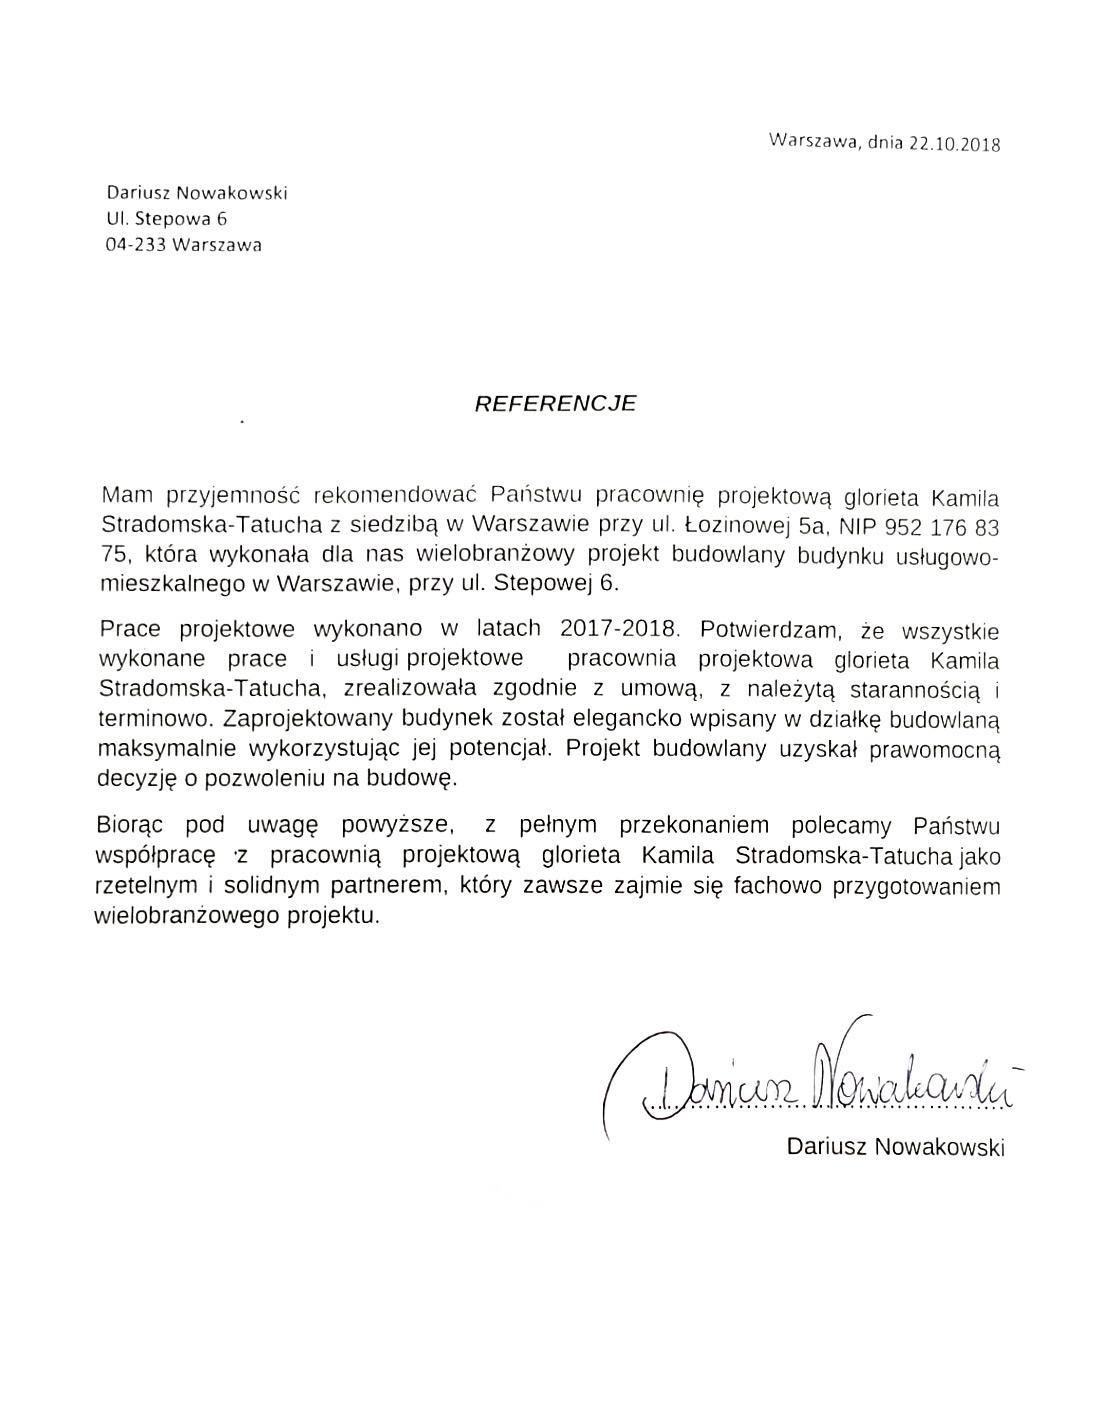 Referencje_Warszawa-2